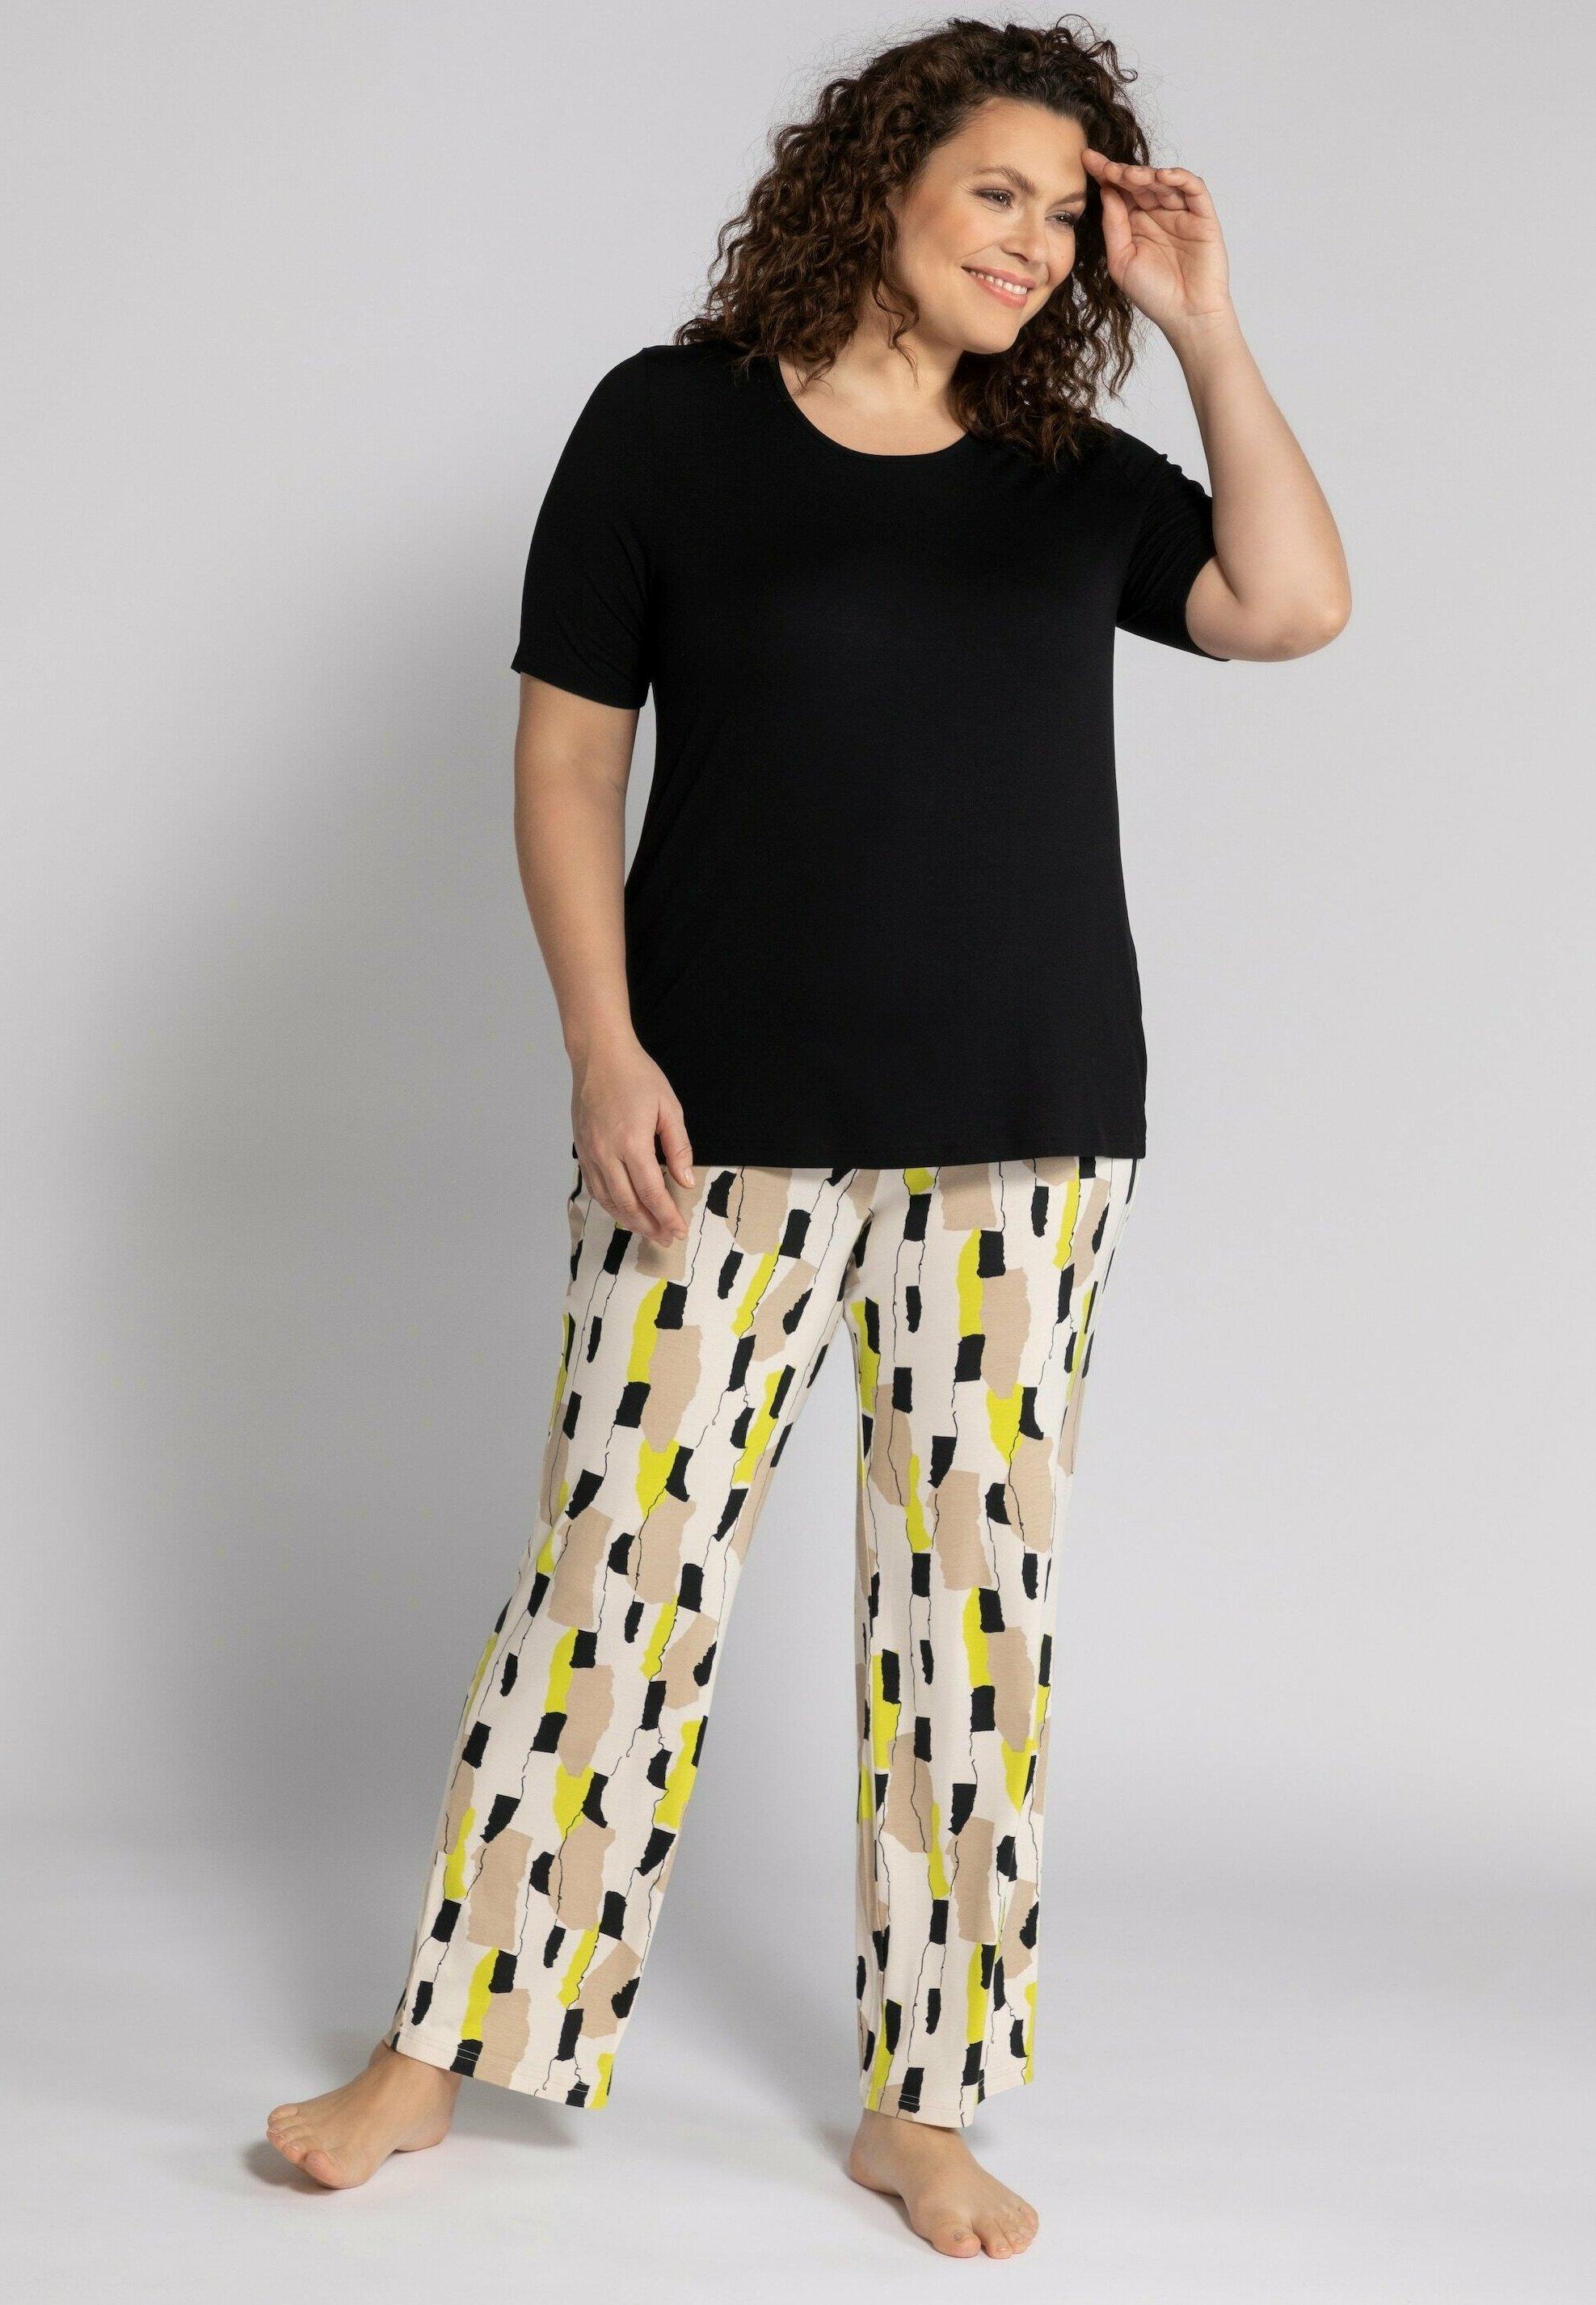 Damen GRANDES TAILLES 2 PIECE SET - Pyjama